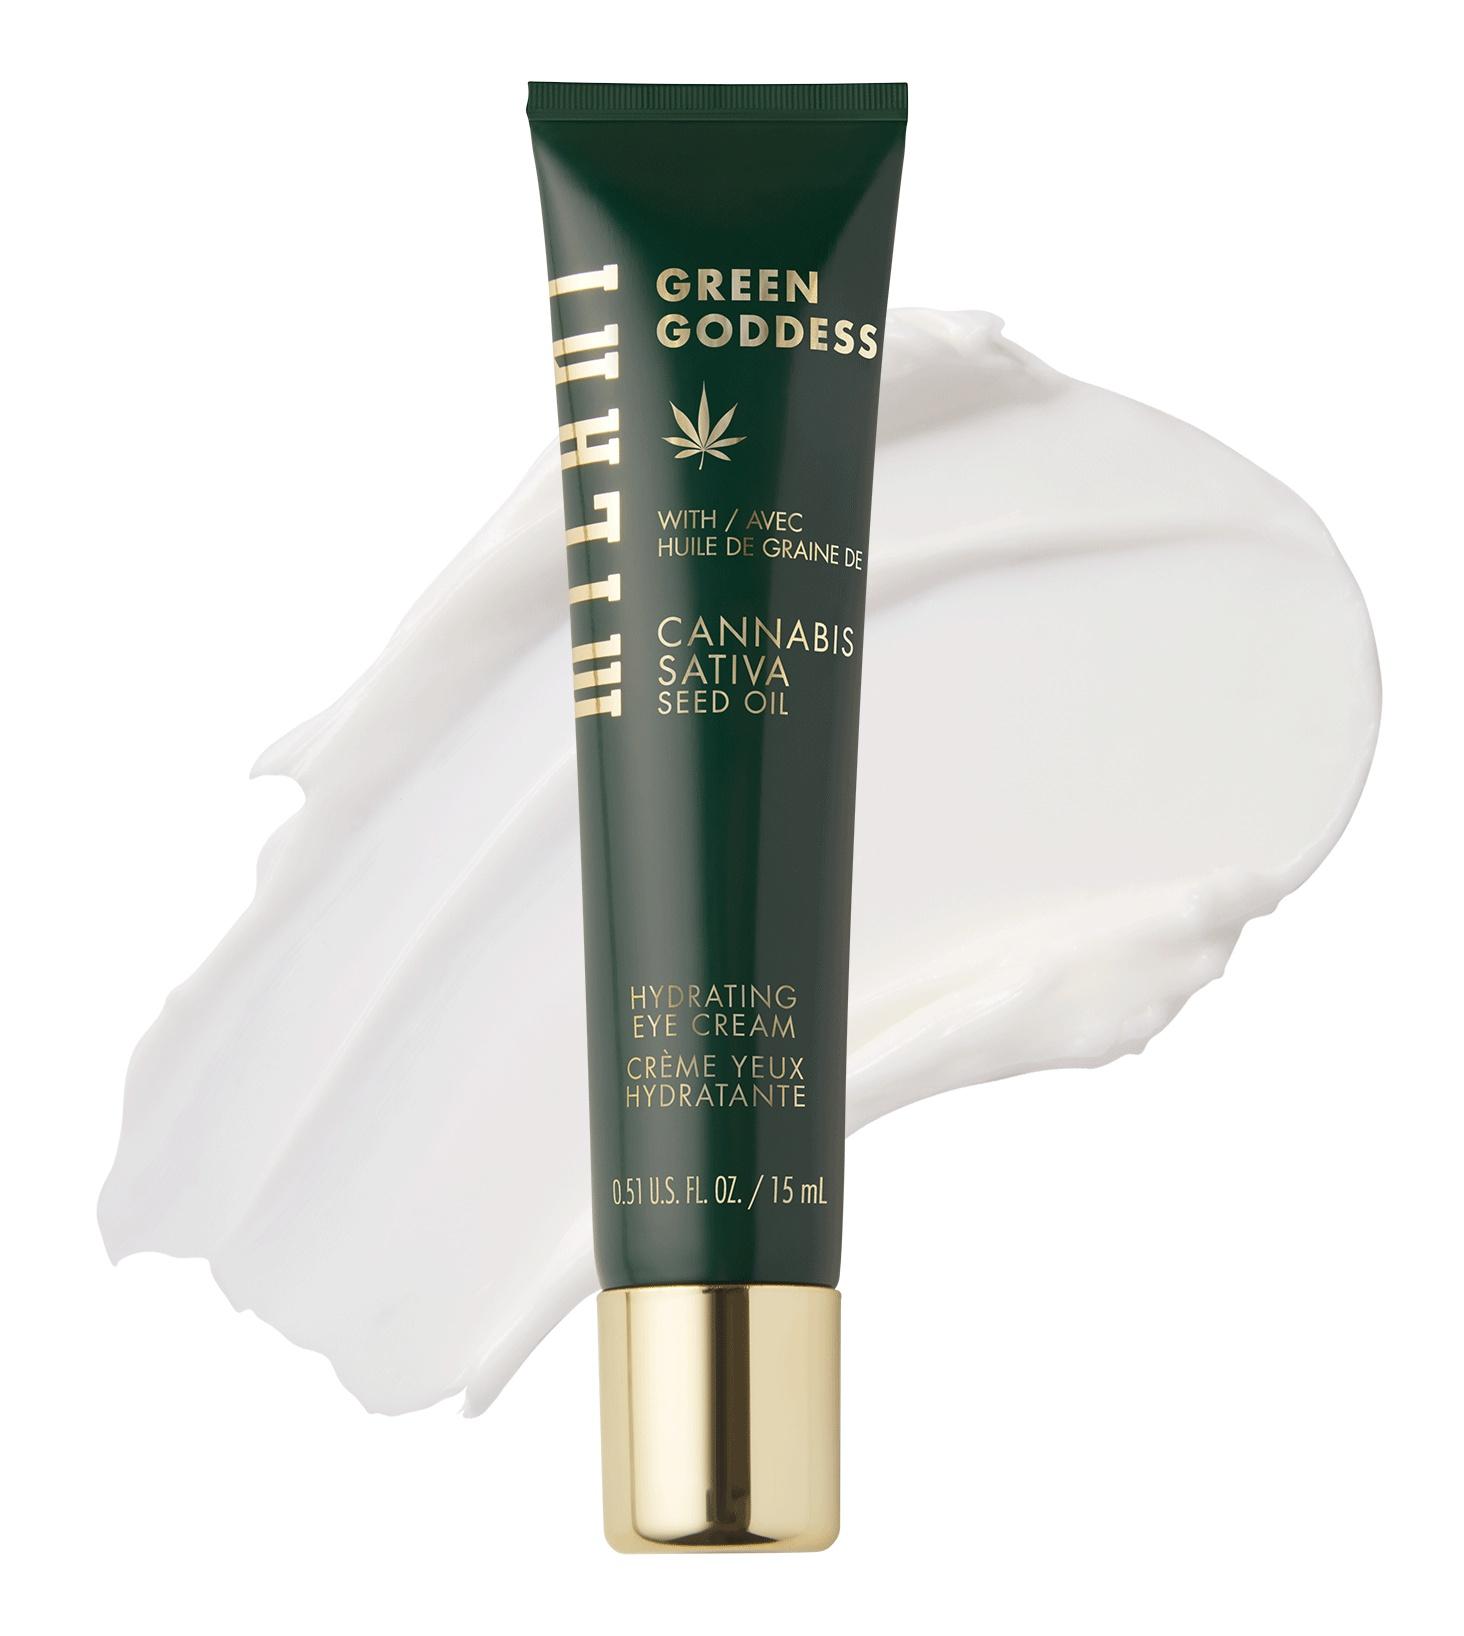 Milani Green Goddess Hydrating Eye Cream